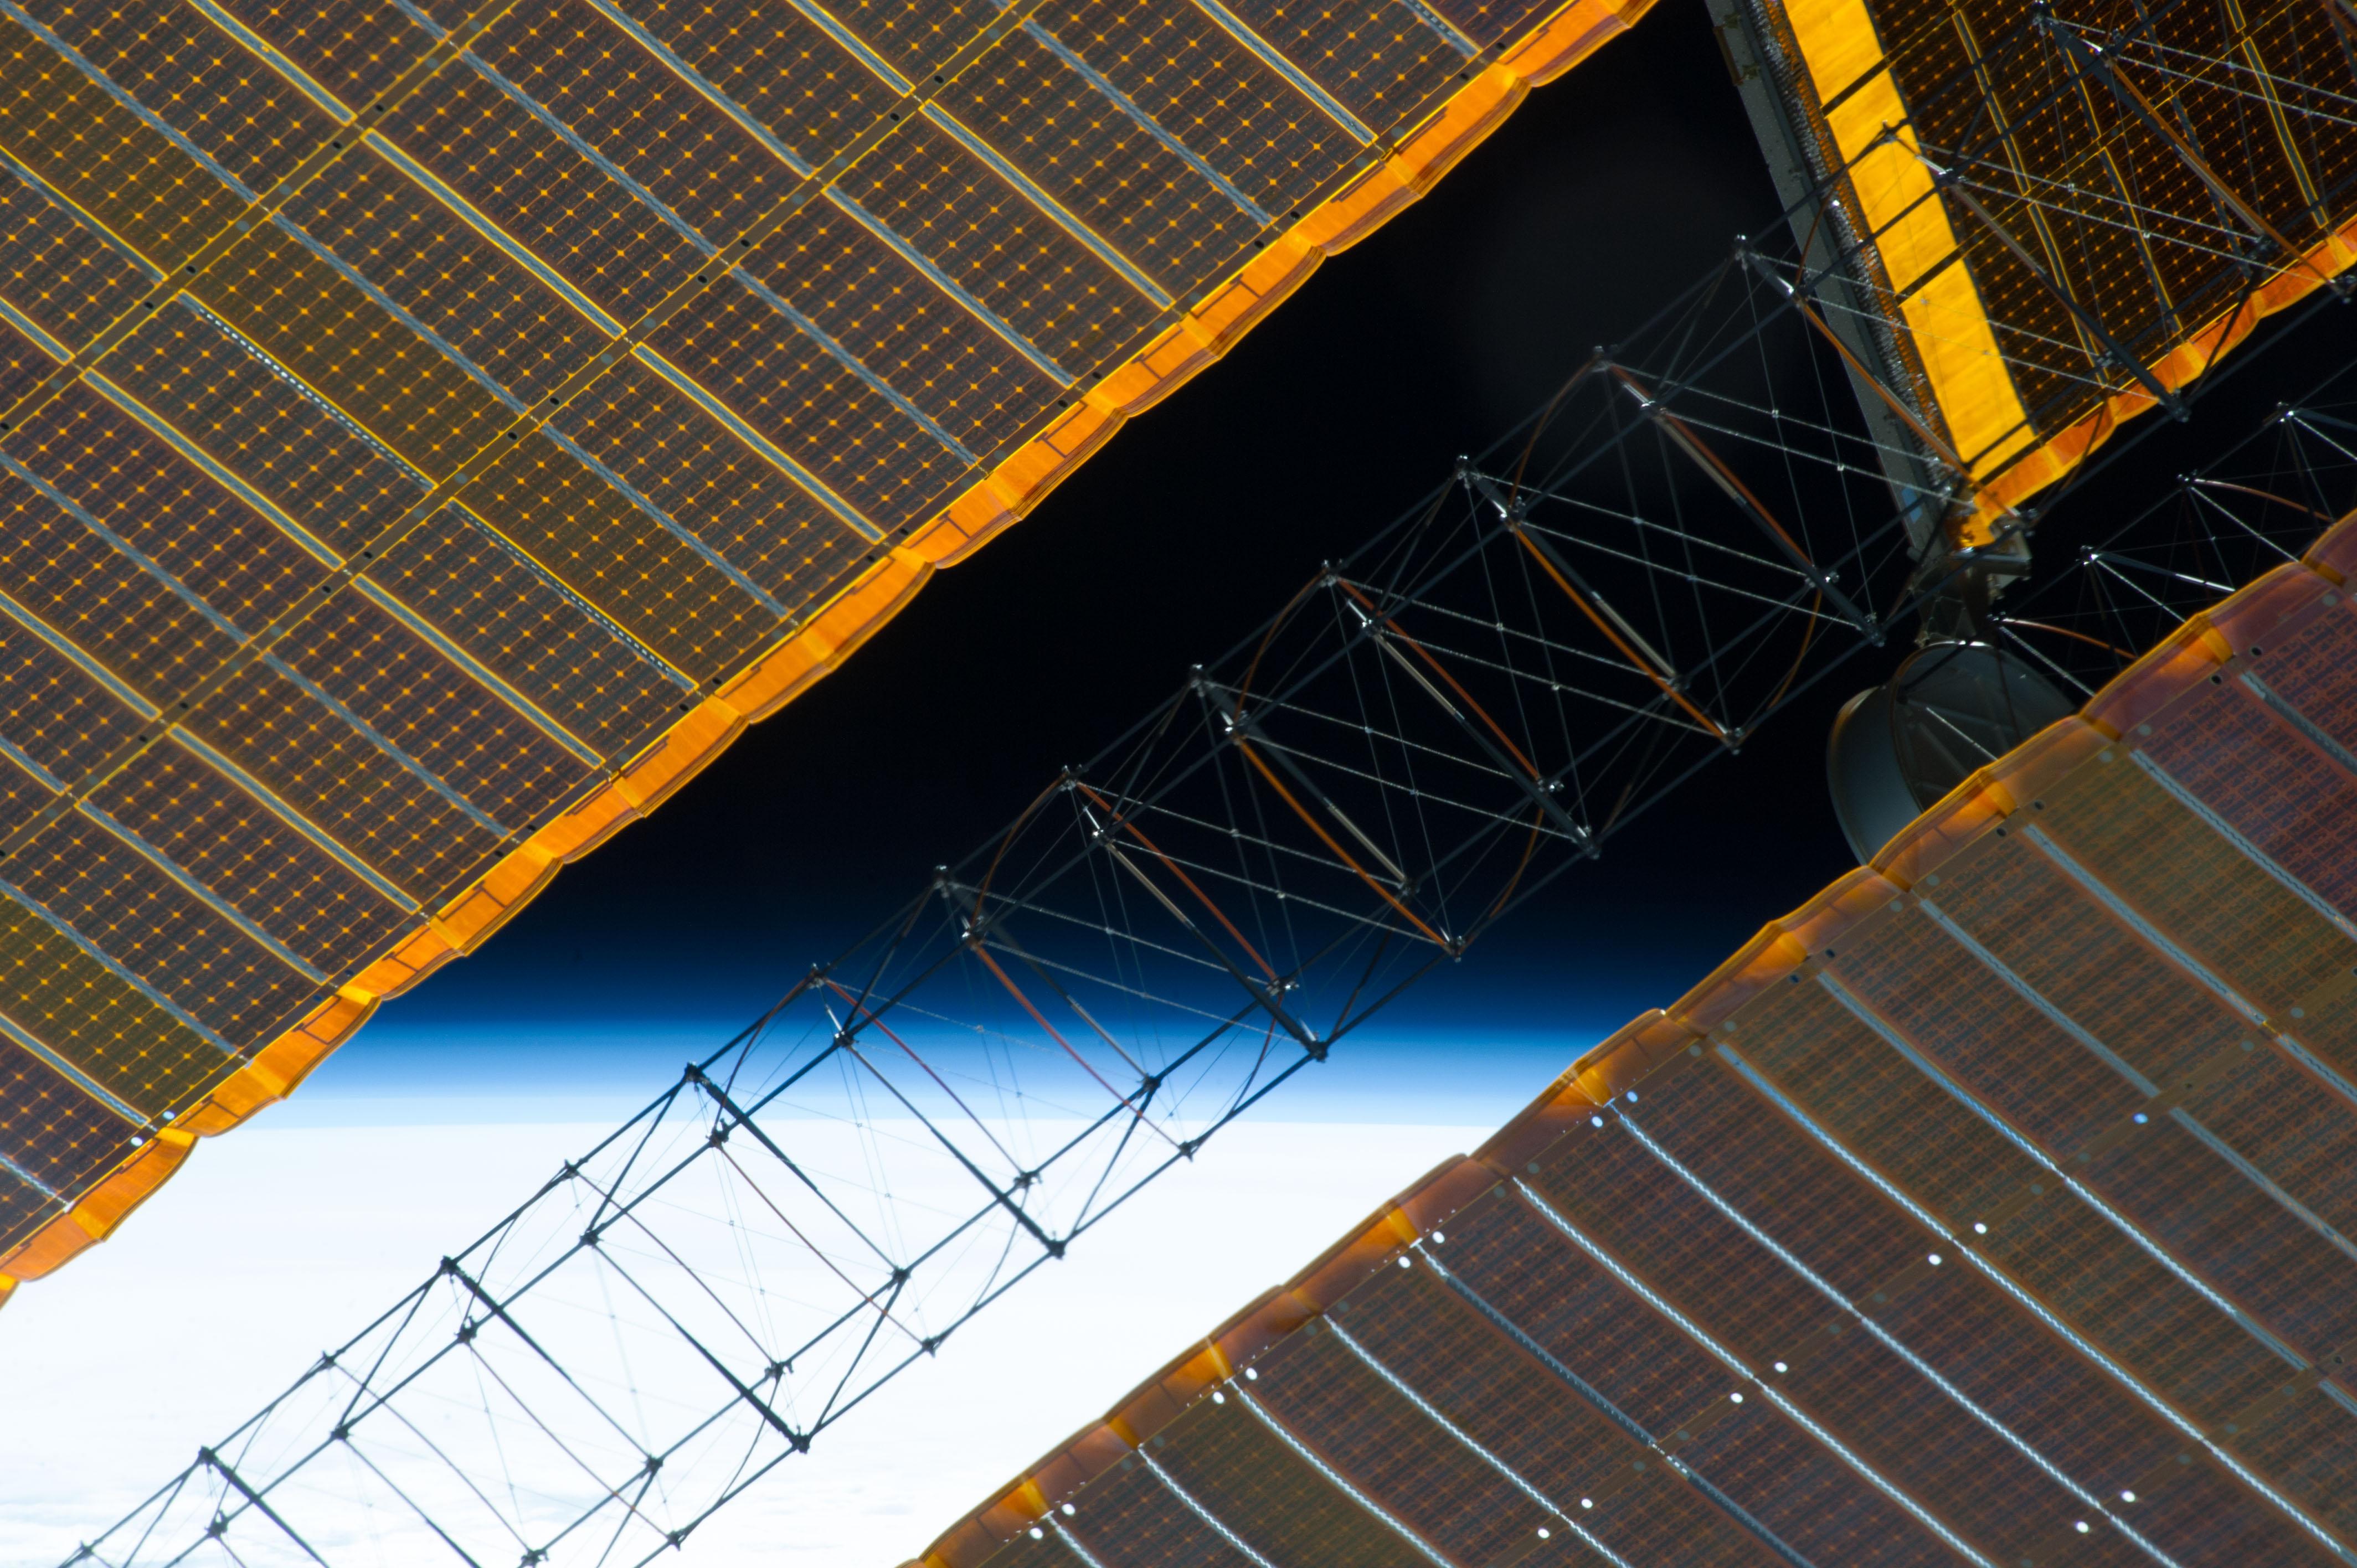 spacecraft solar array panels - photo #13